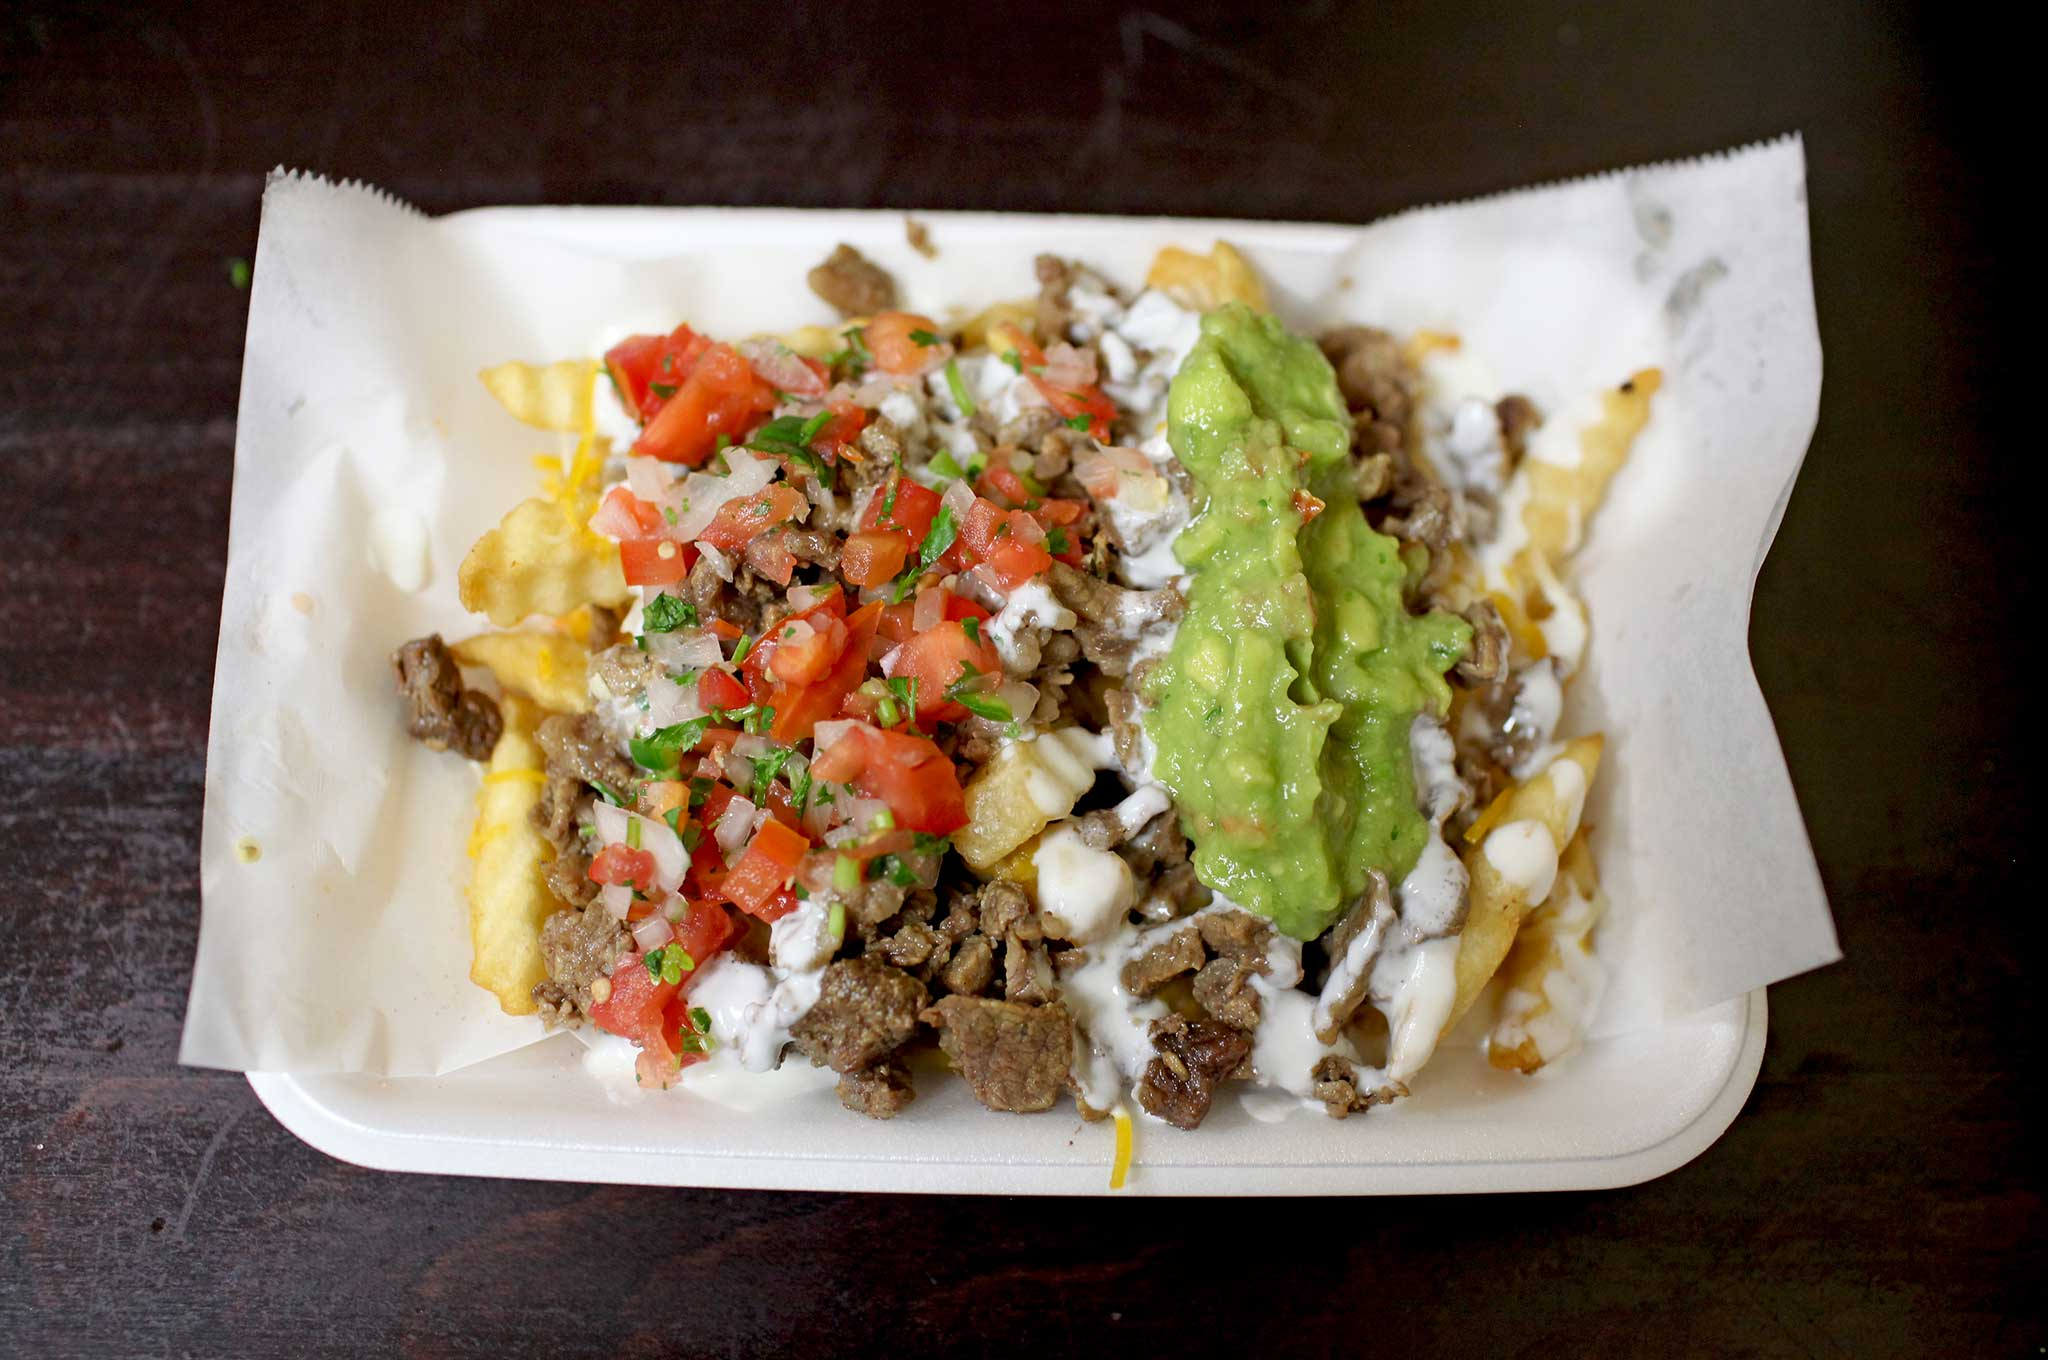 vip-tacos-carne-asada-fries